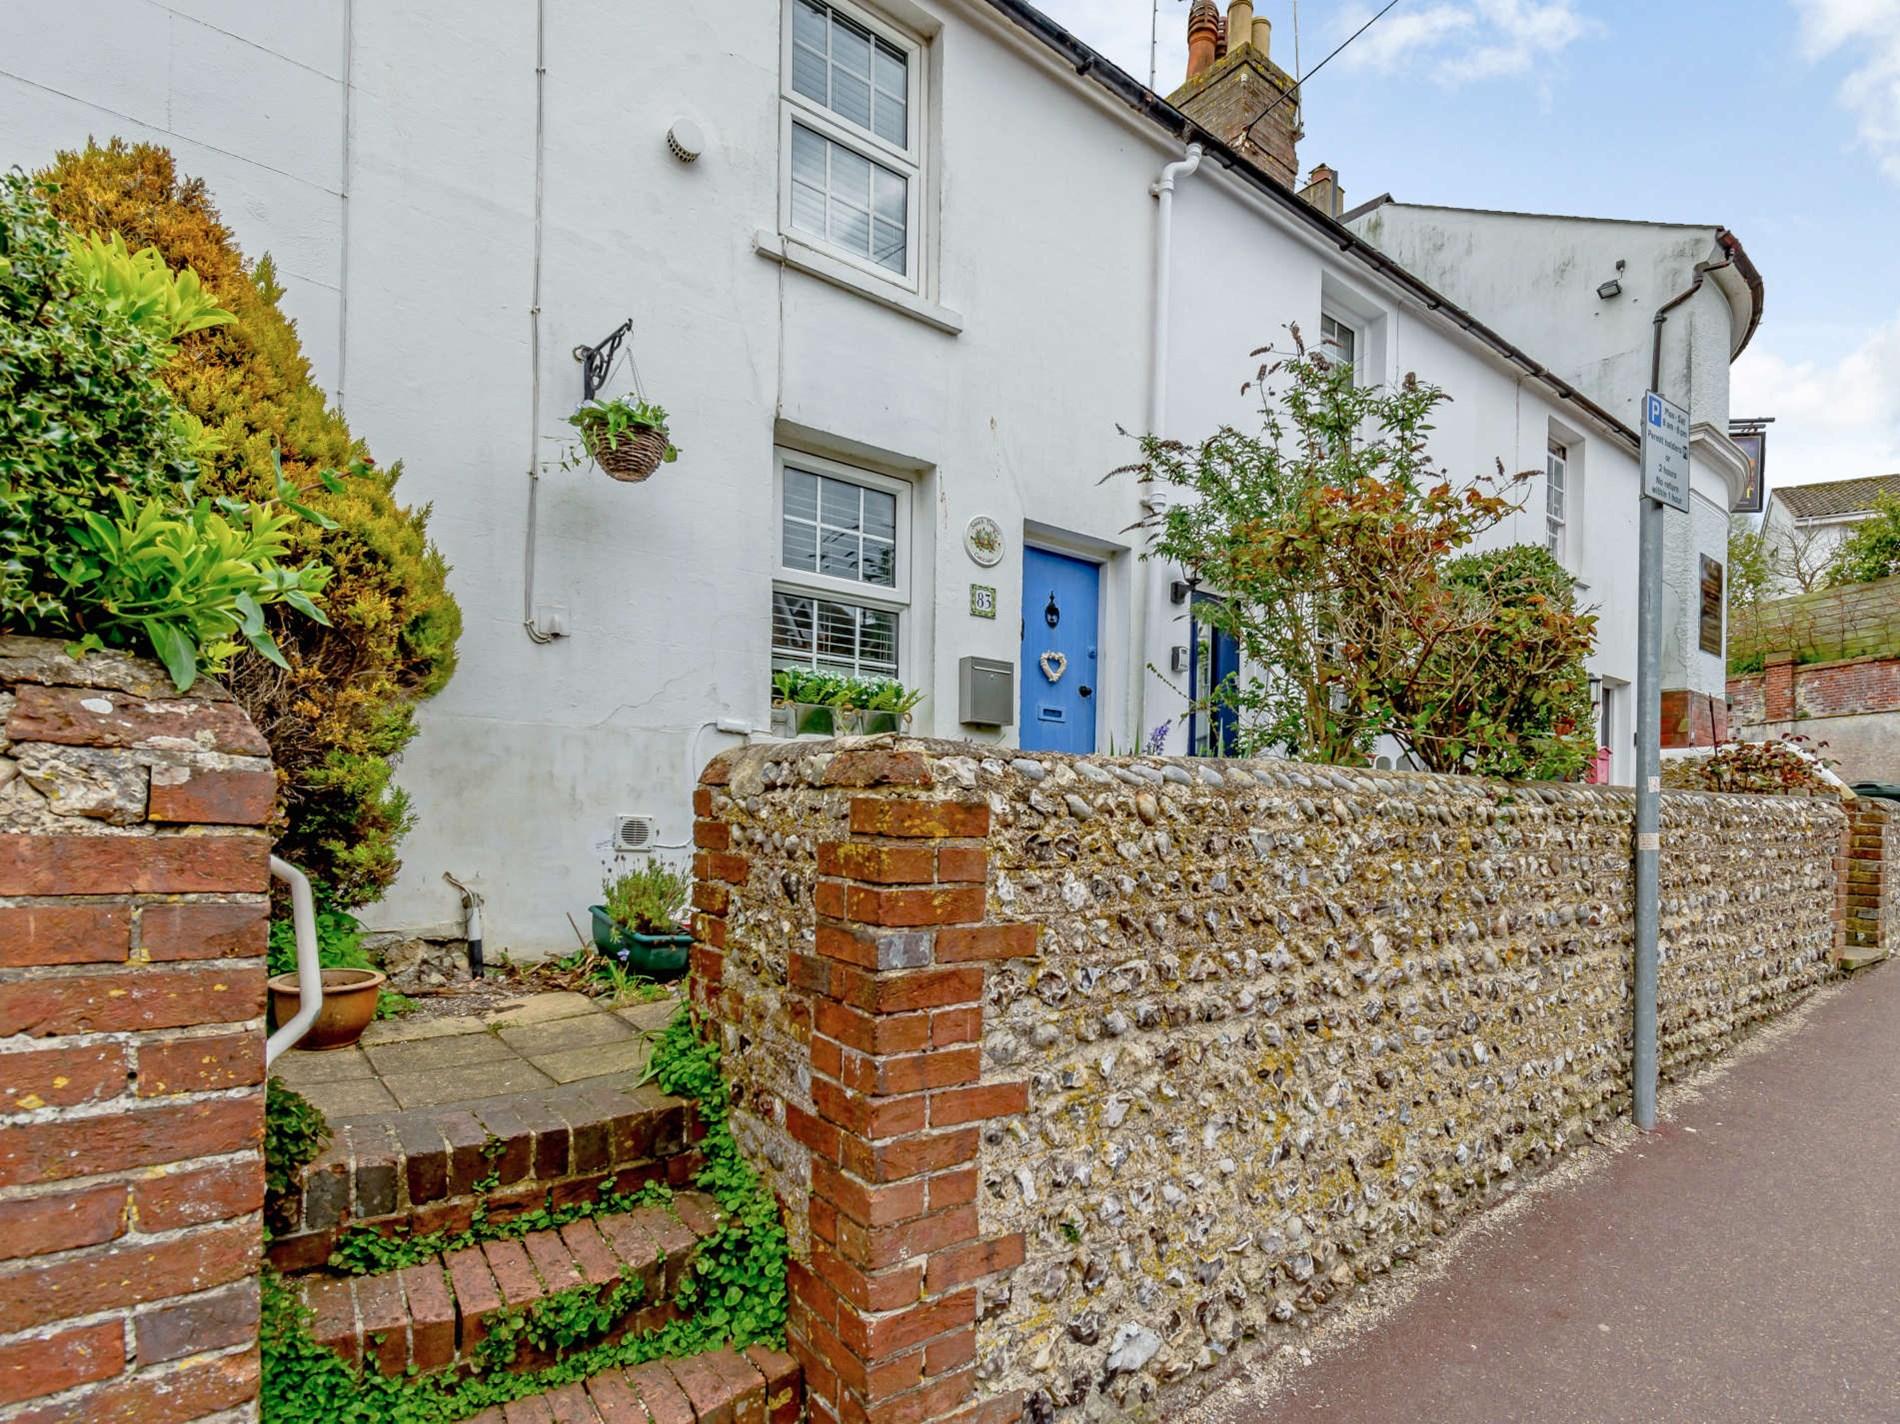 1 Bedroom Cottage in Eastbourne, South of England